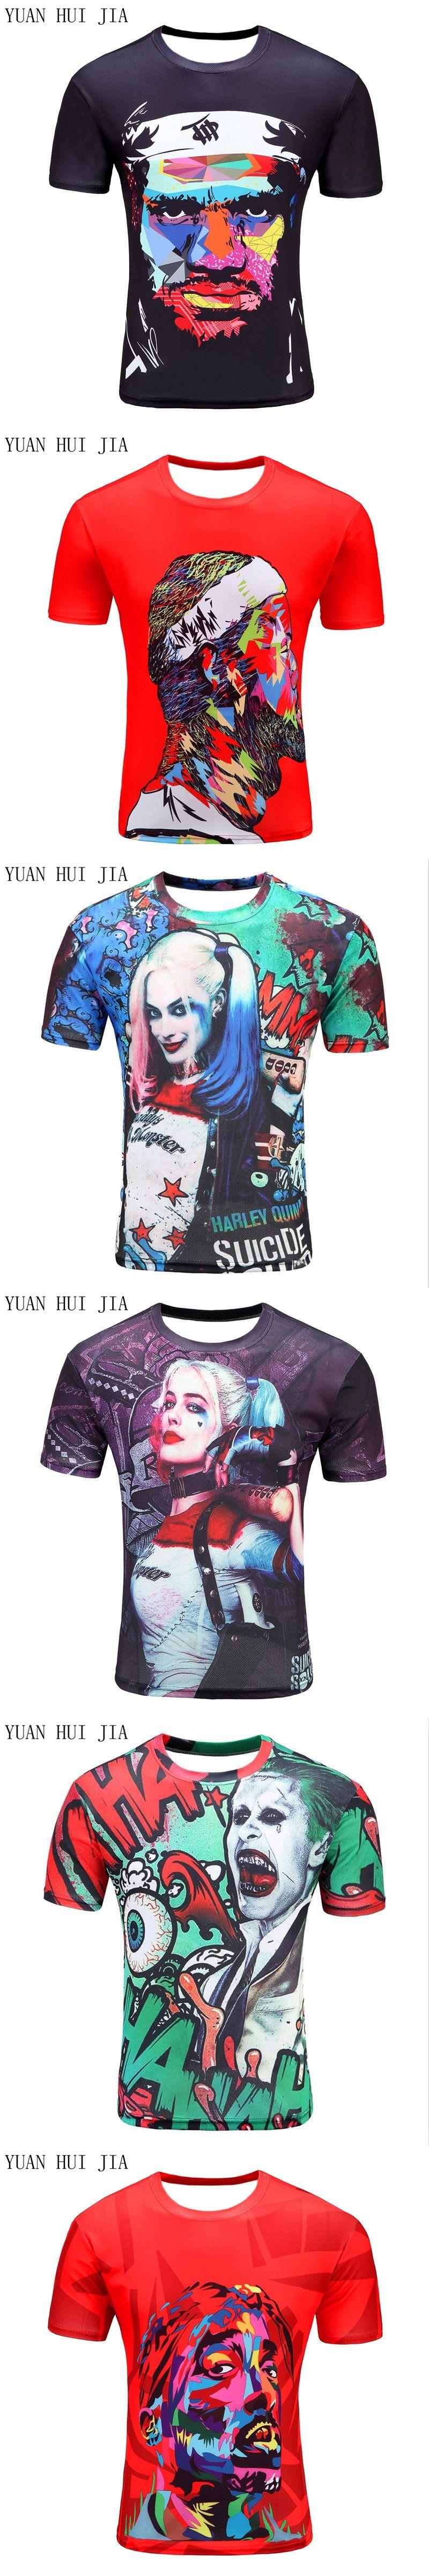 3c52c252 Mens Harley Quinn Joker T Shirts 3D Deadshot T-shirts Funny Movie Tops  Summer Suicide